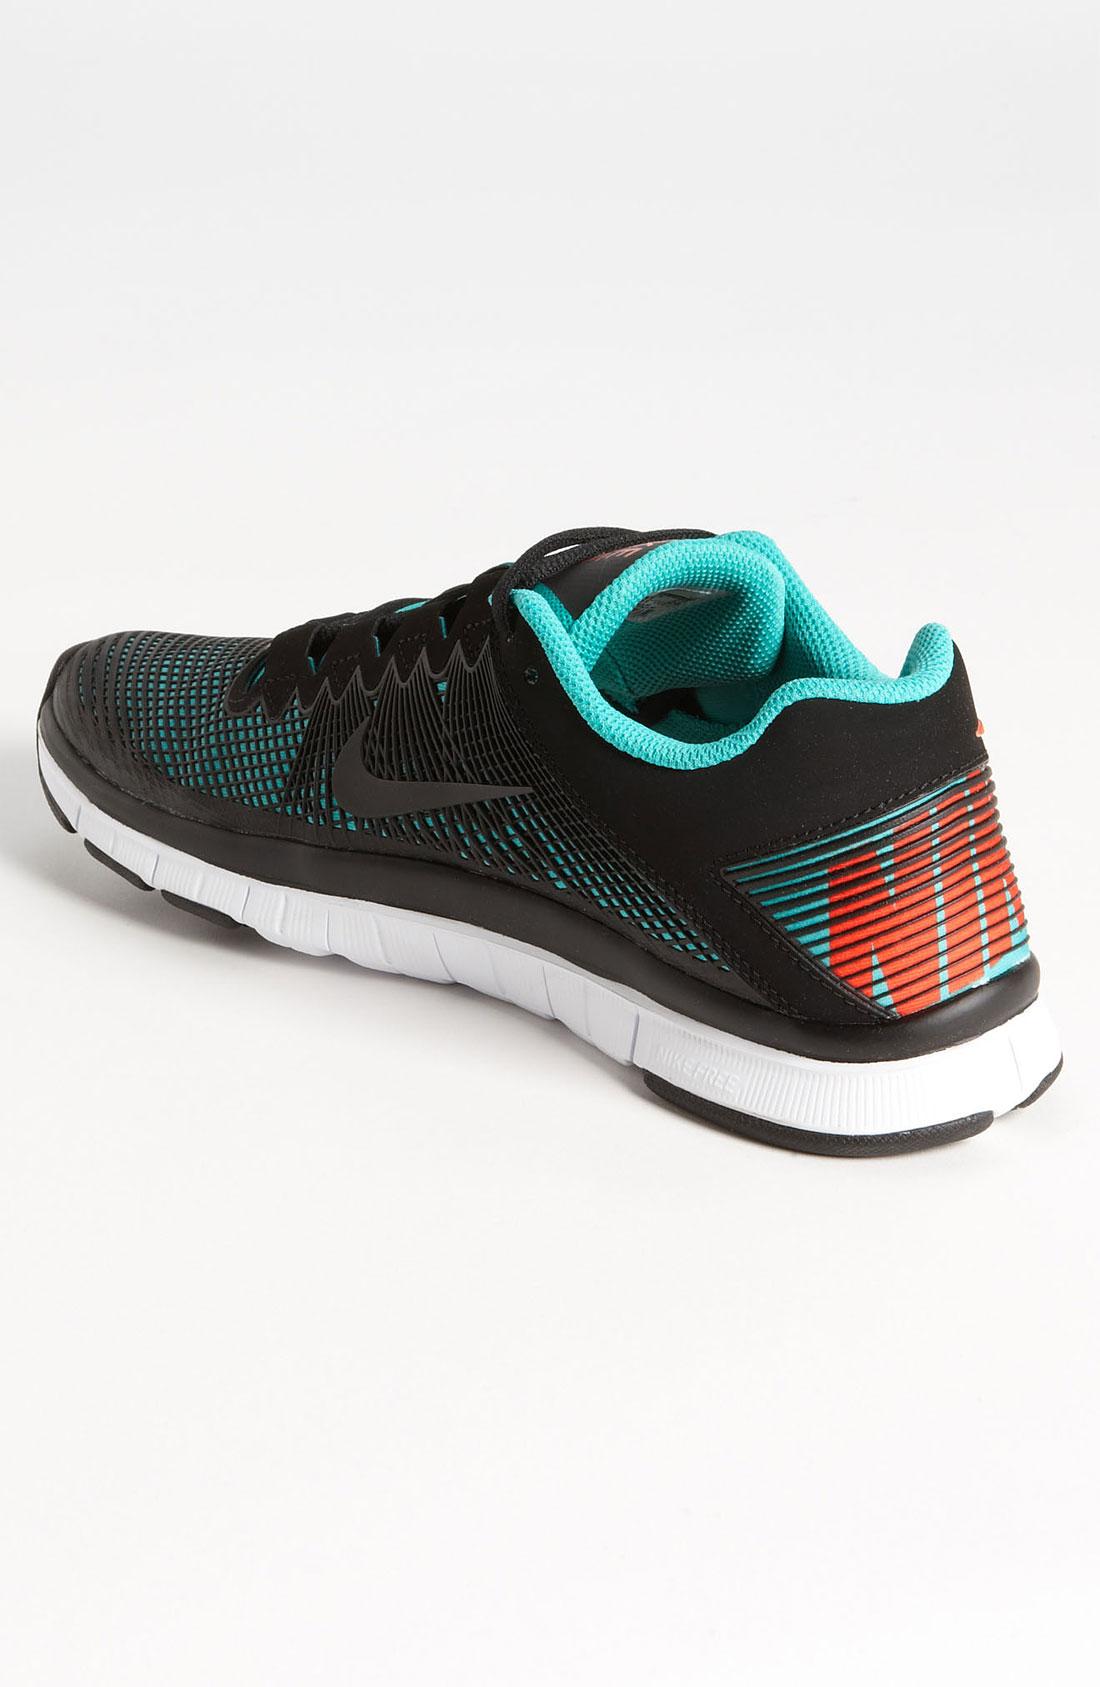 size 40 afae5 c0617 Nike Free Trainer 30 Training Shoe Men in Blue for Men (atomic teal   orange  black)   Lyst